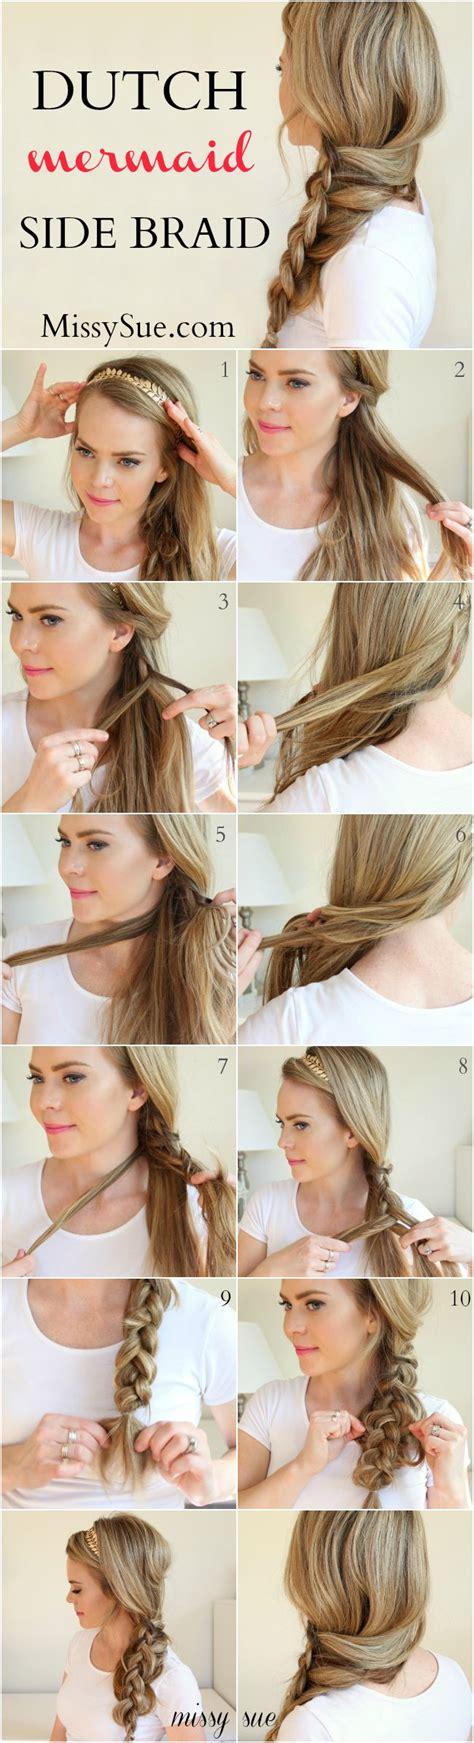 the ultimate mermaid braid step by step instructions side swept braid hair you won t miss hair tutorials